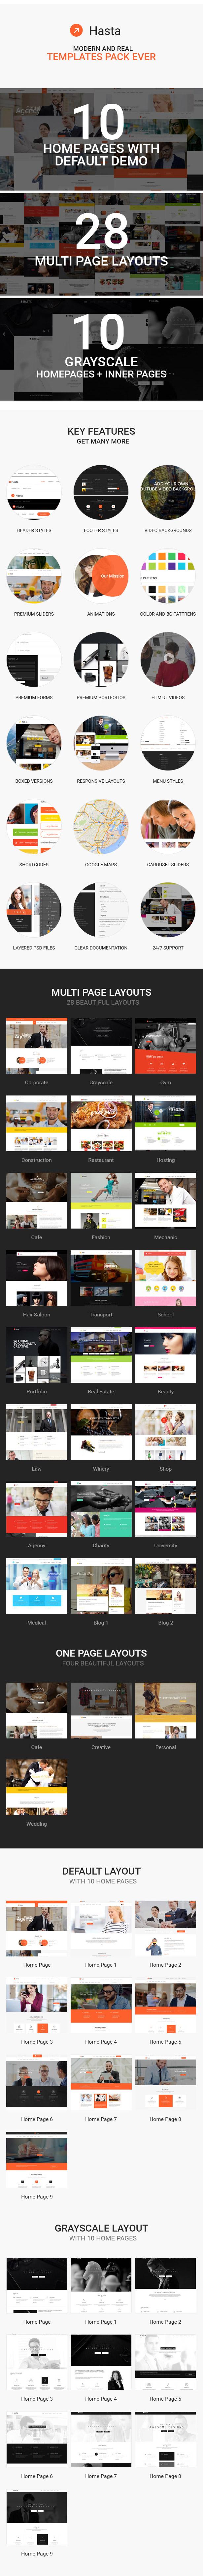 item showcase - Hasta - Responsive Multipurpose HTML5 Template